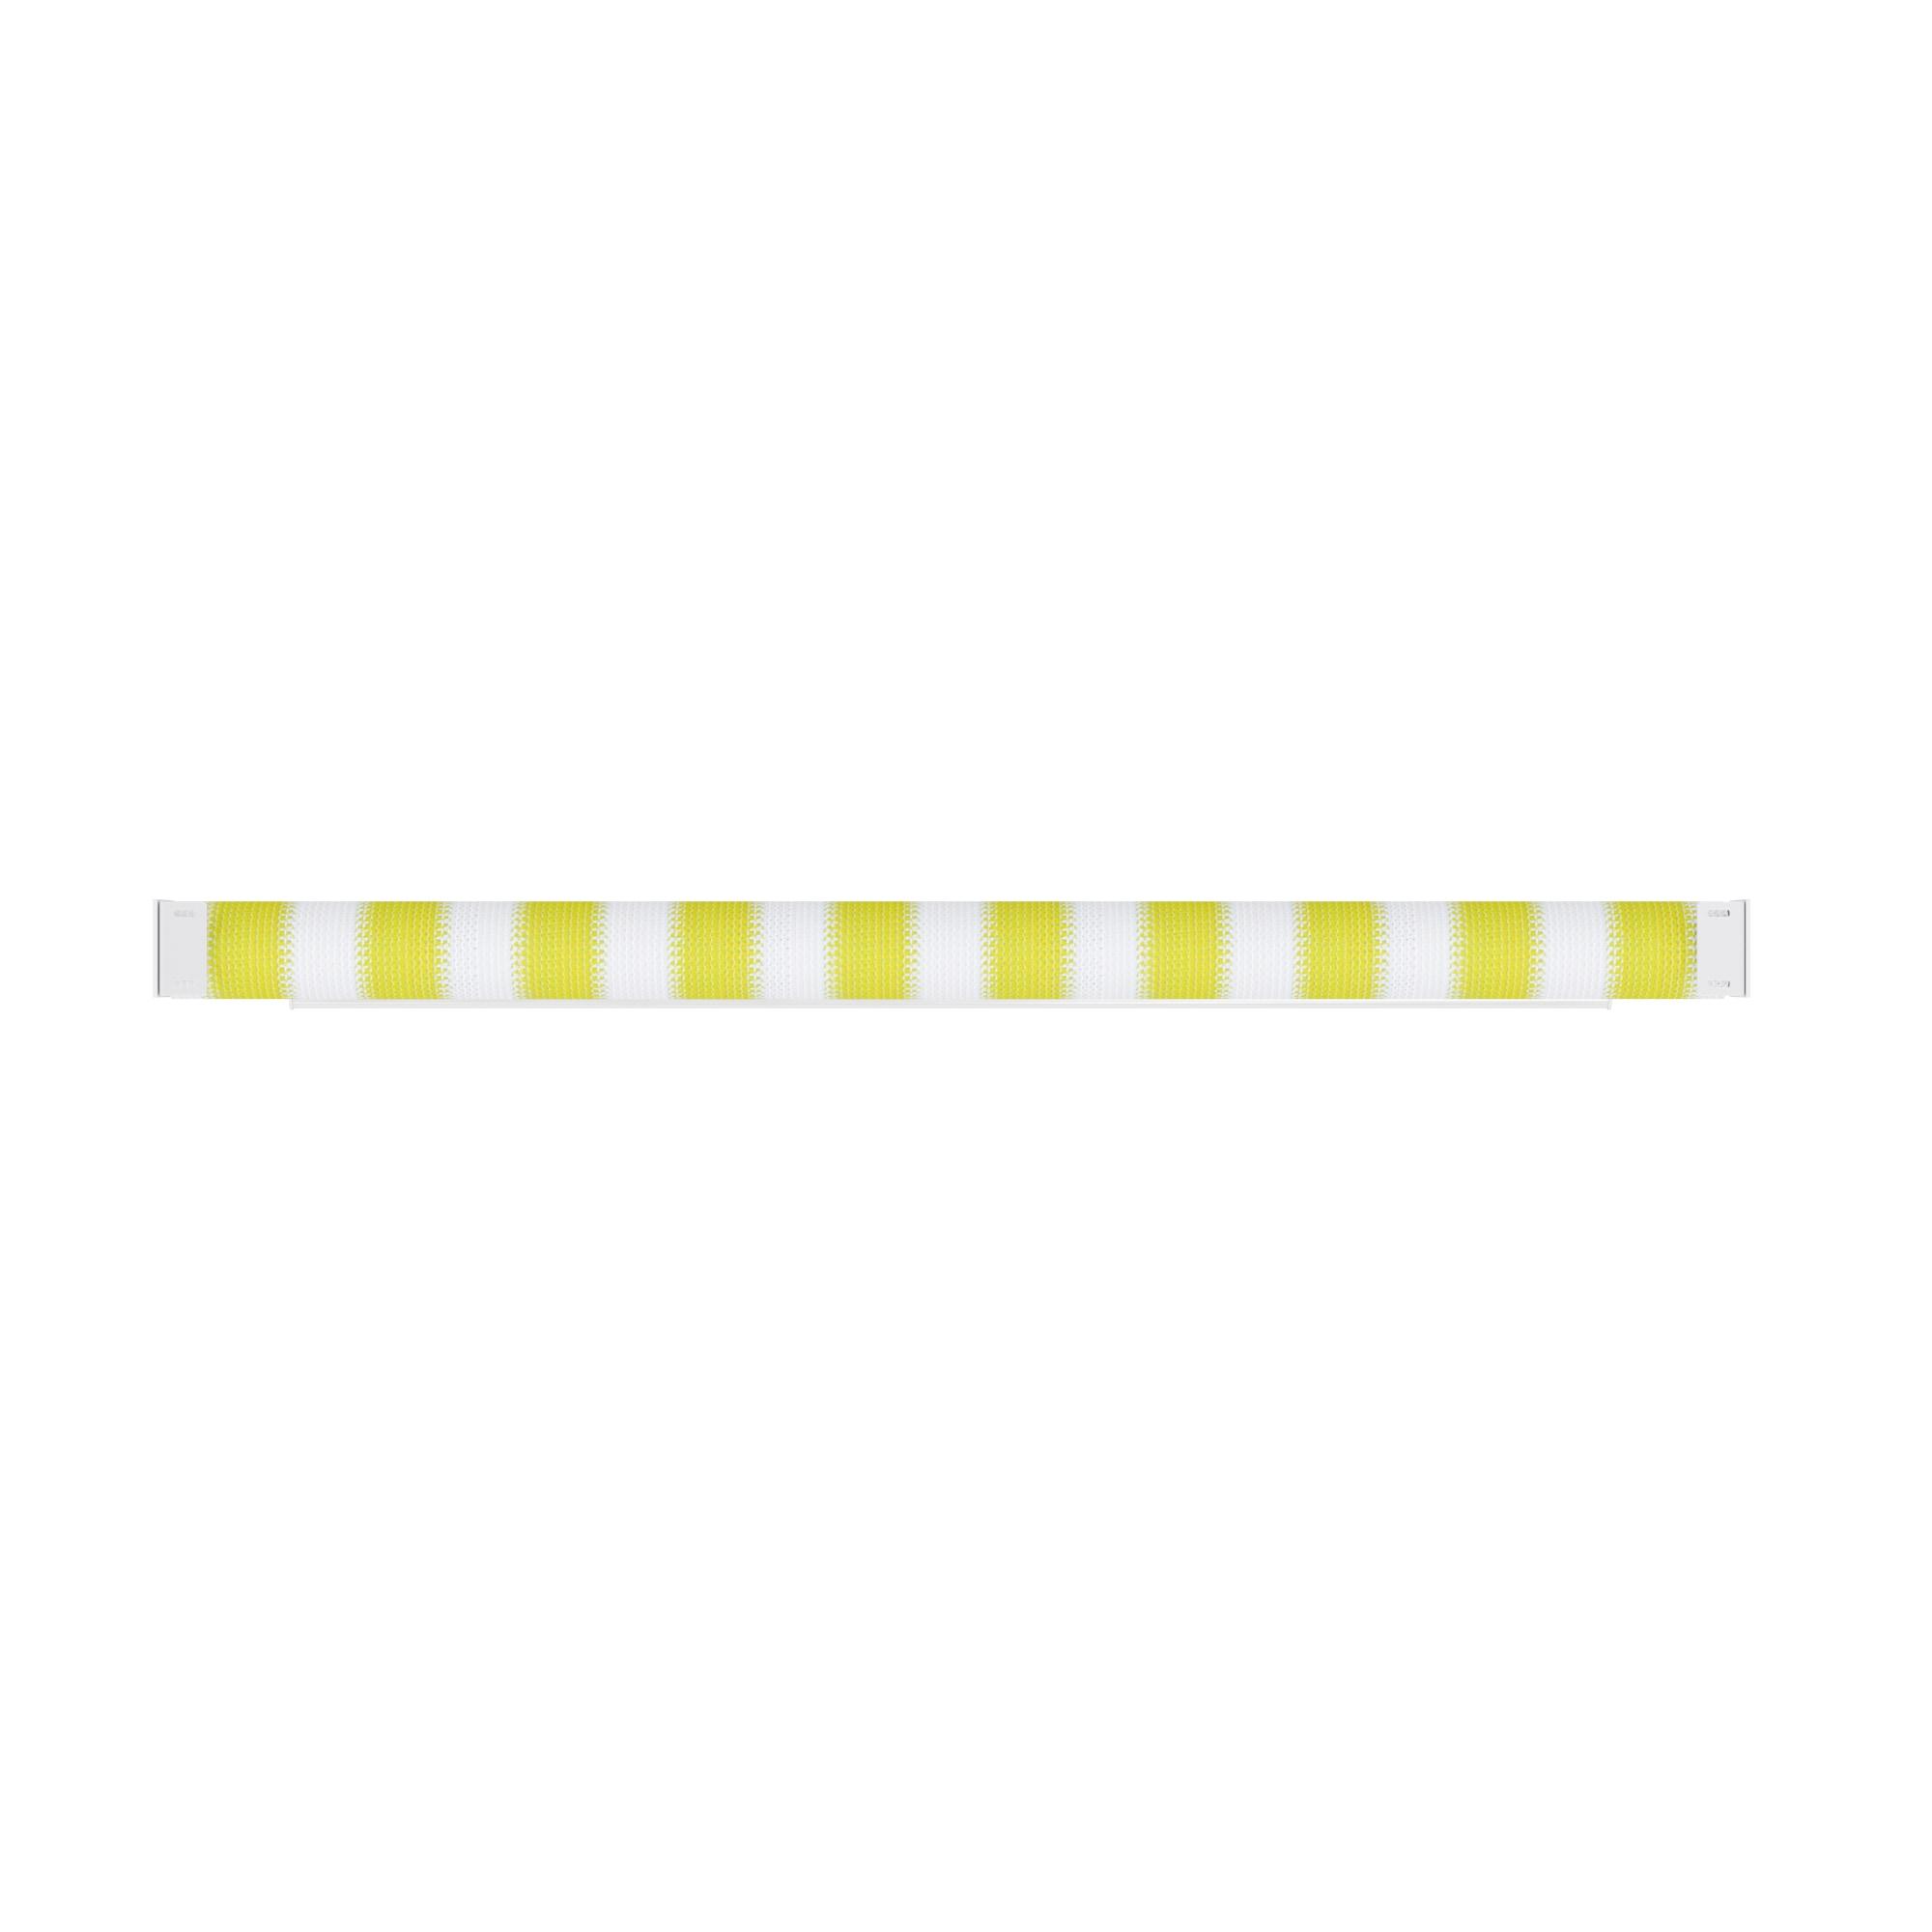 JAROLIFT-Senkrechtmarkise-Sichtschutz-Aussenrollo-Sonnenschutz-Aussen-Rollo-Balkon Indexbild 25